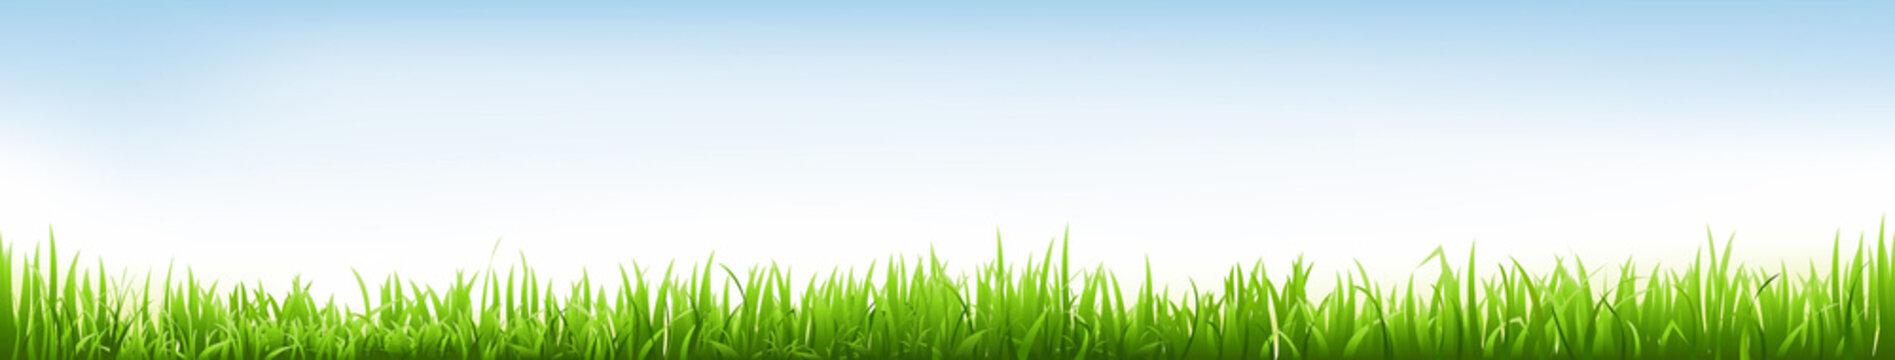 Header With Grass